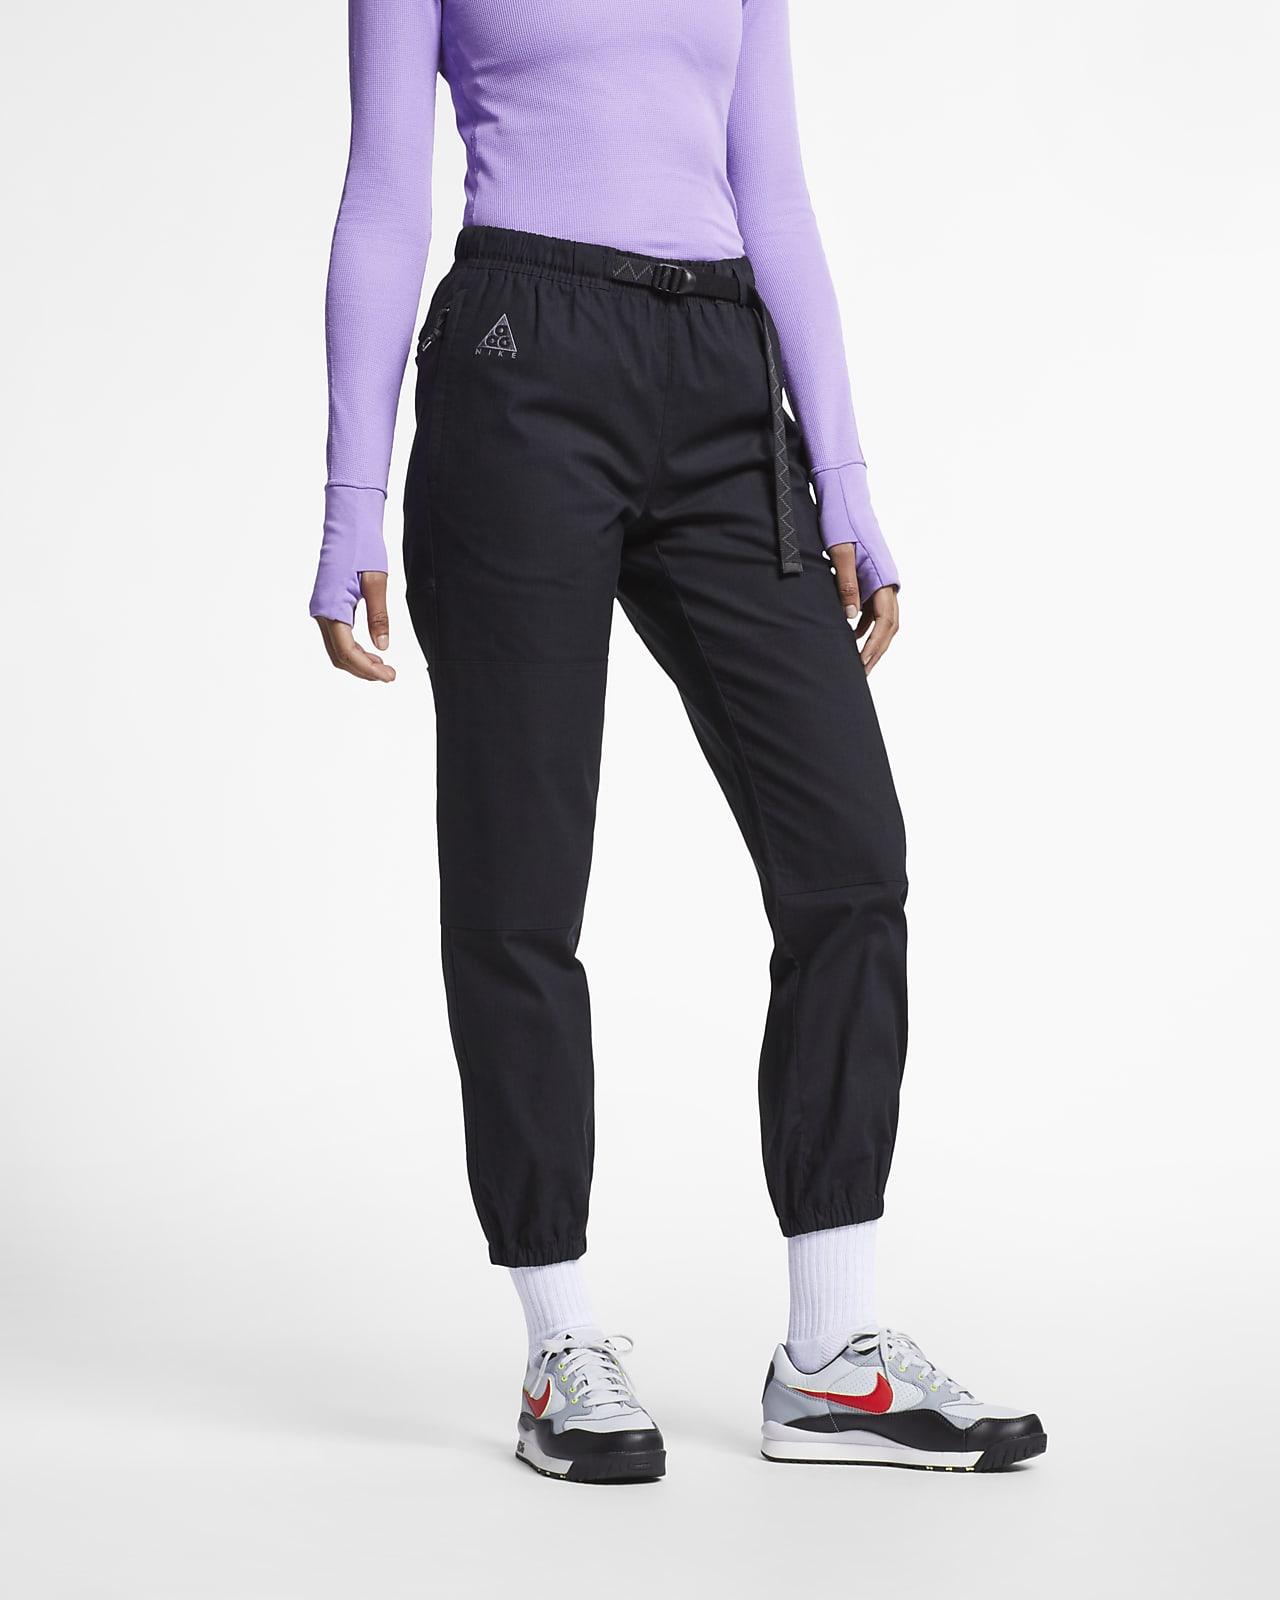 Nike ACG Women's Woven Trousers